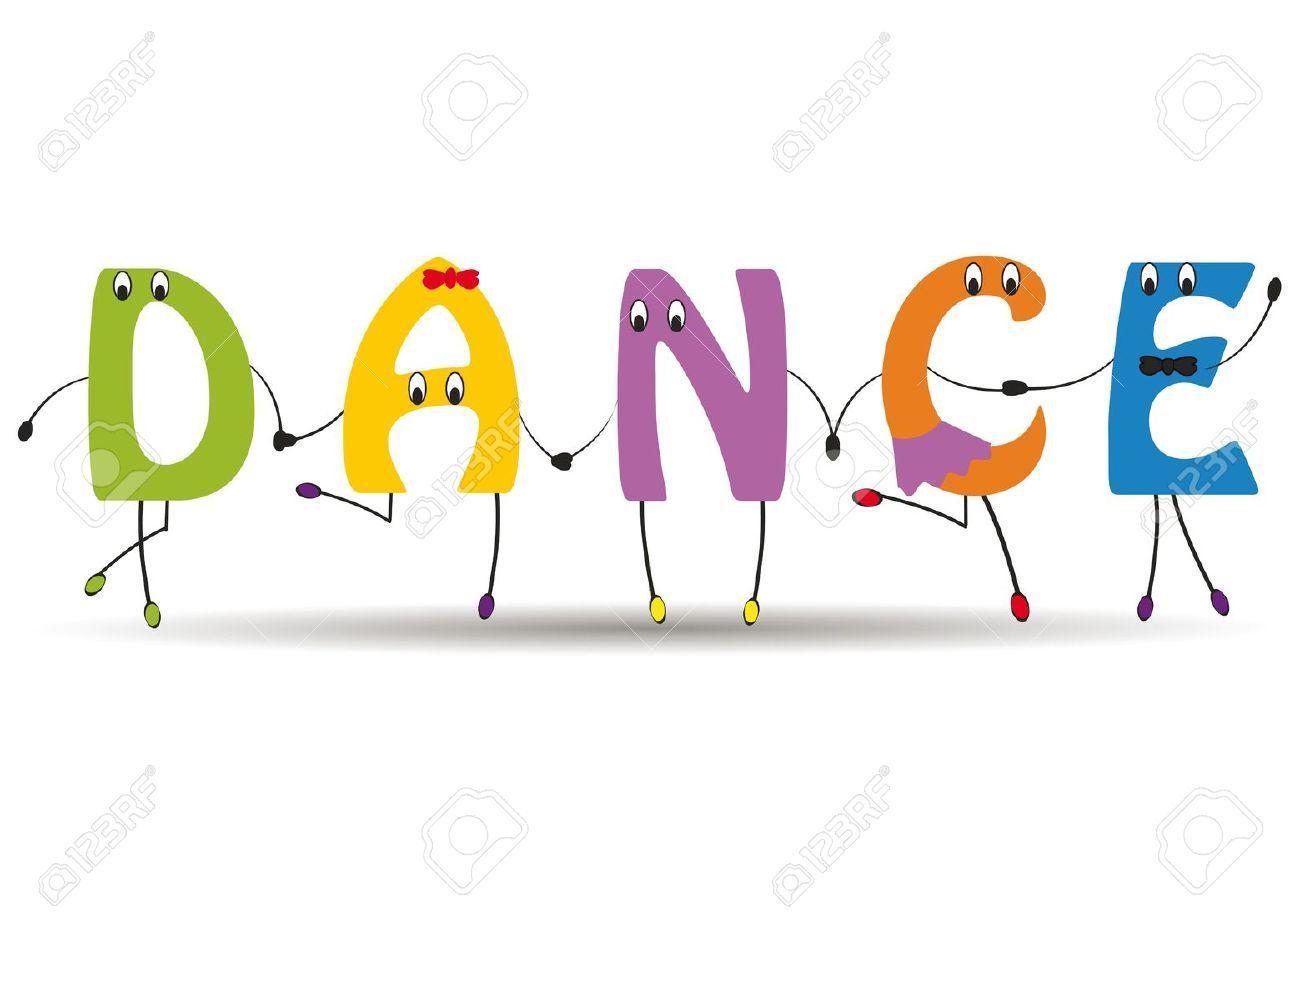 Freeze Dance Preschool Lesson Plan | The Preschool Project Lesson ...